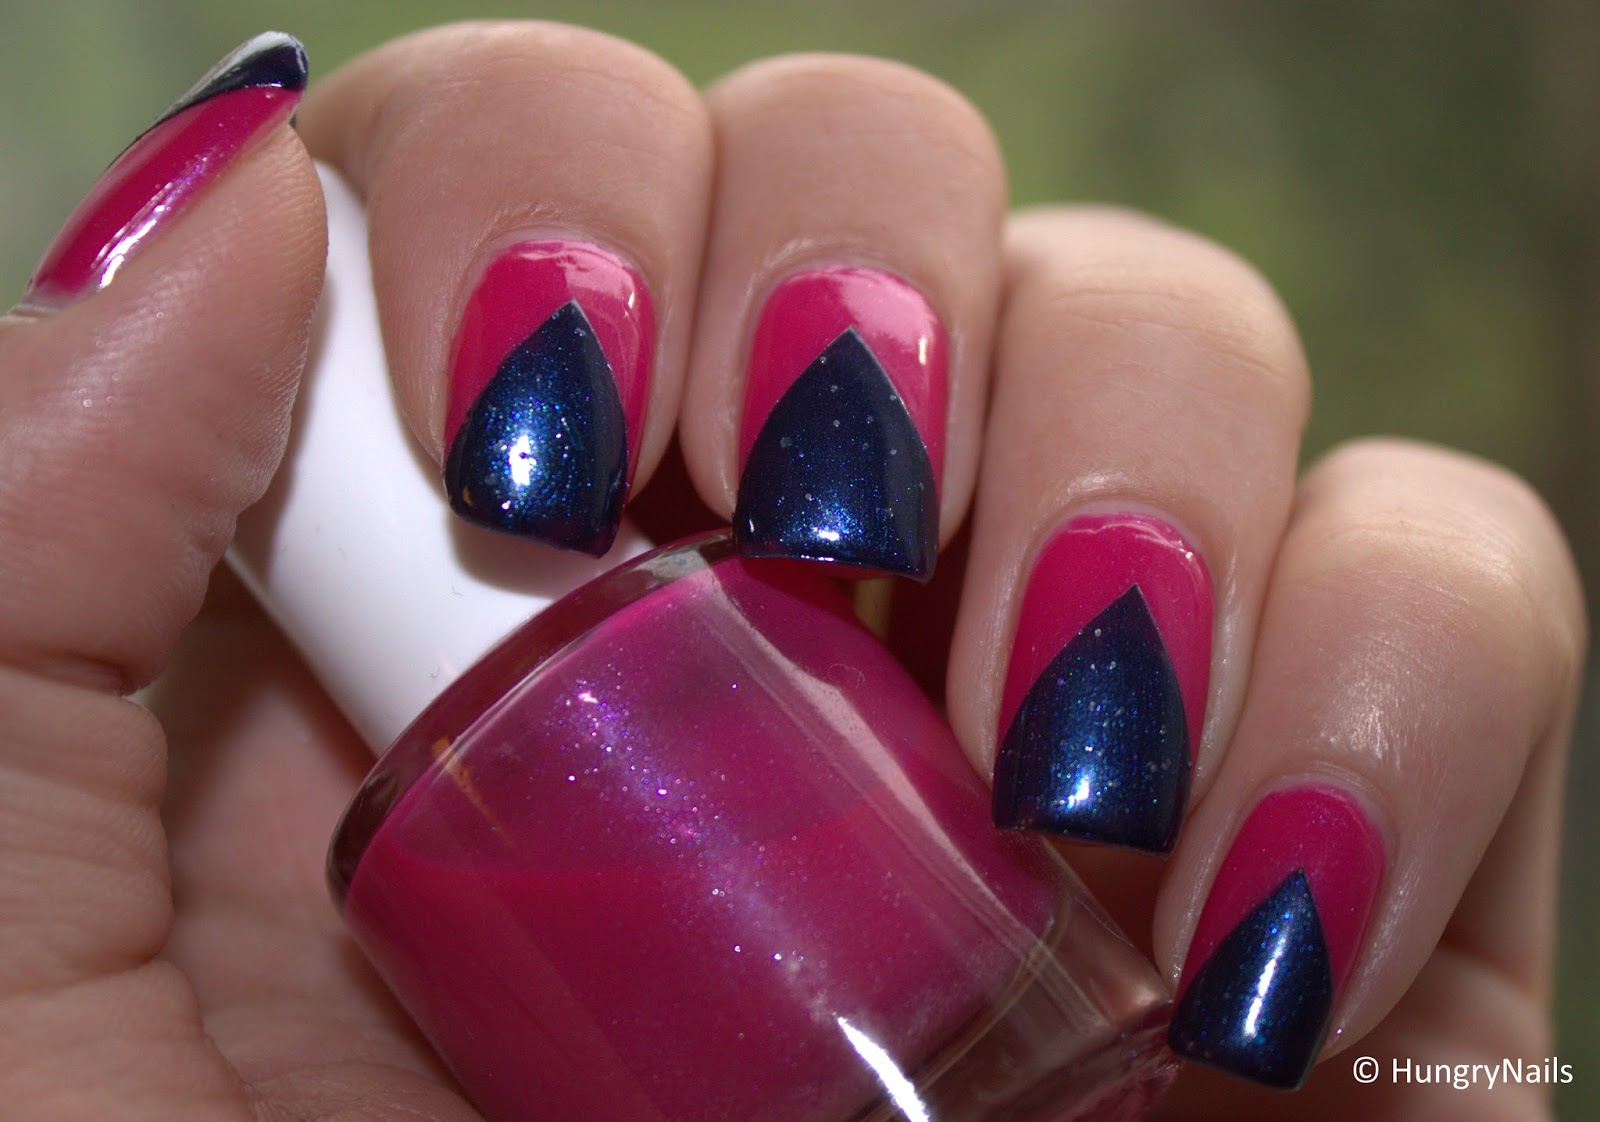 http://hungrynails.blogspot.de/2014/04/diy-nail-polish.html